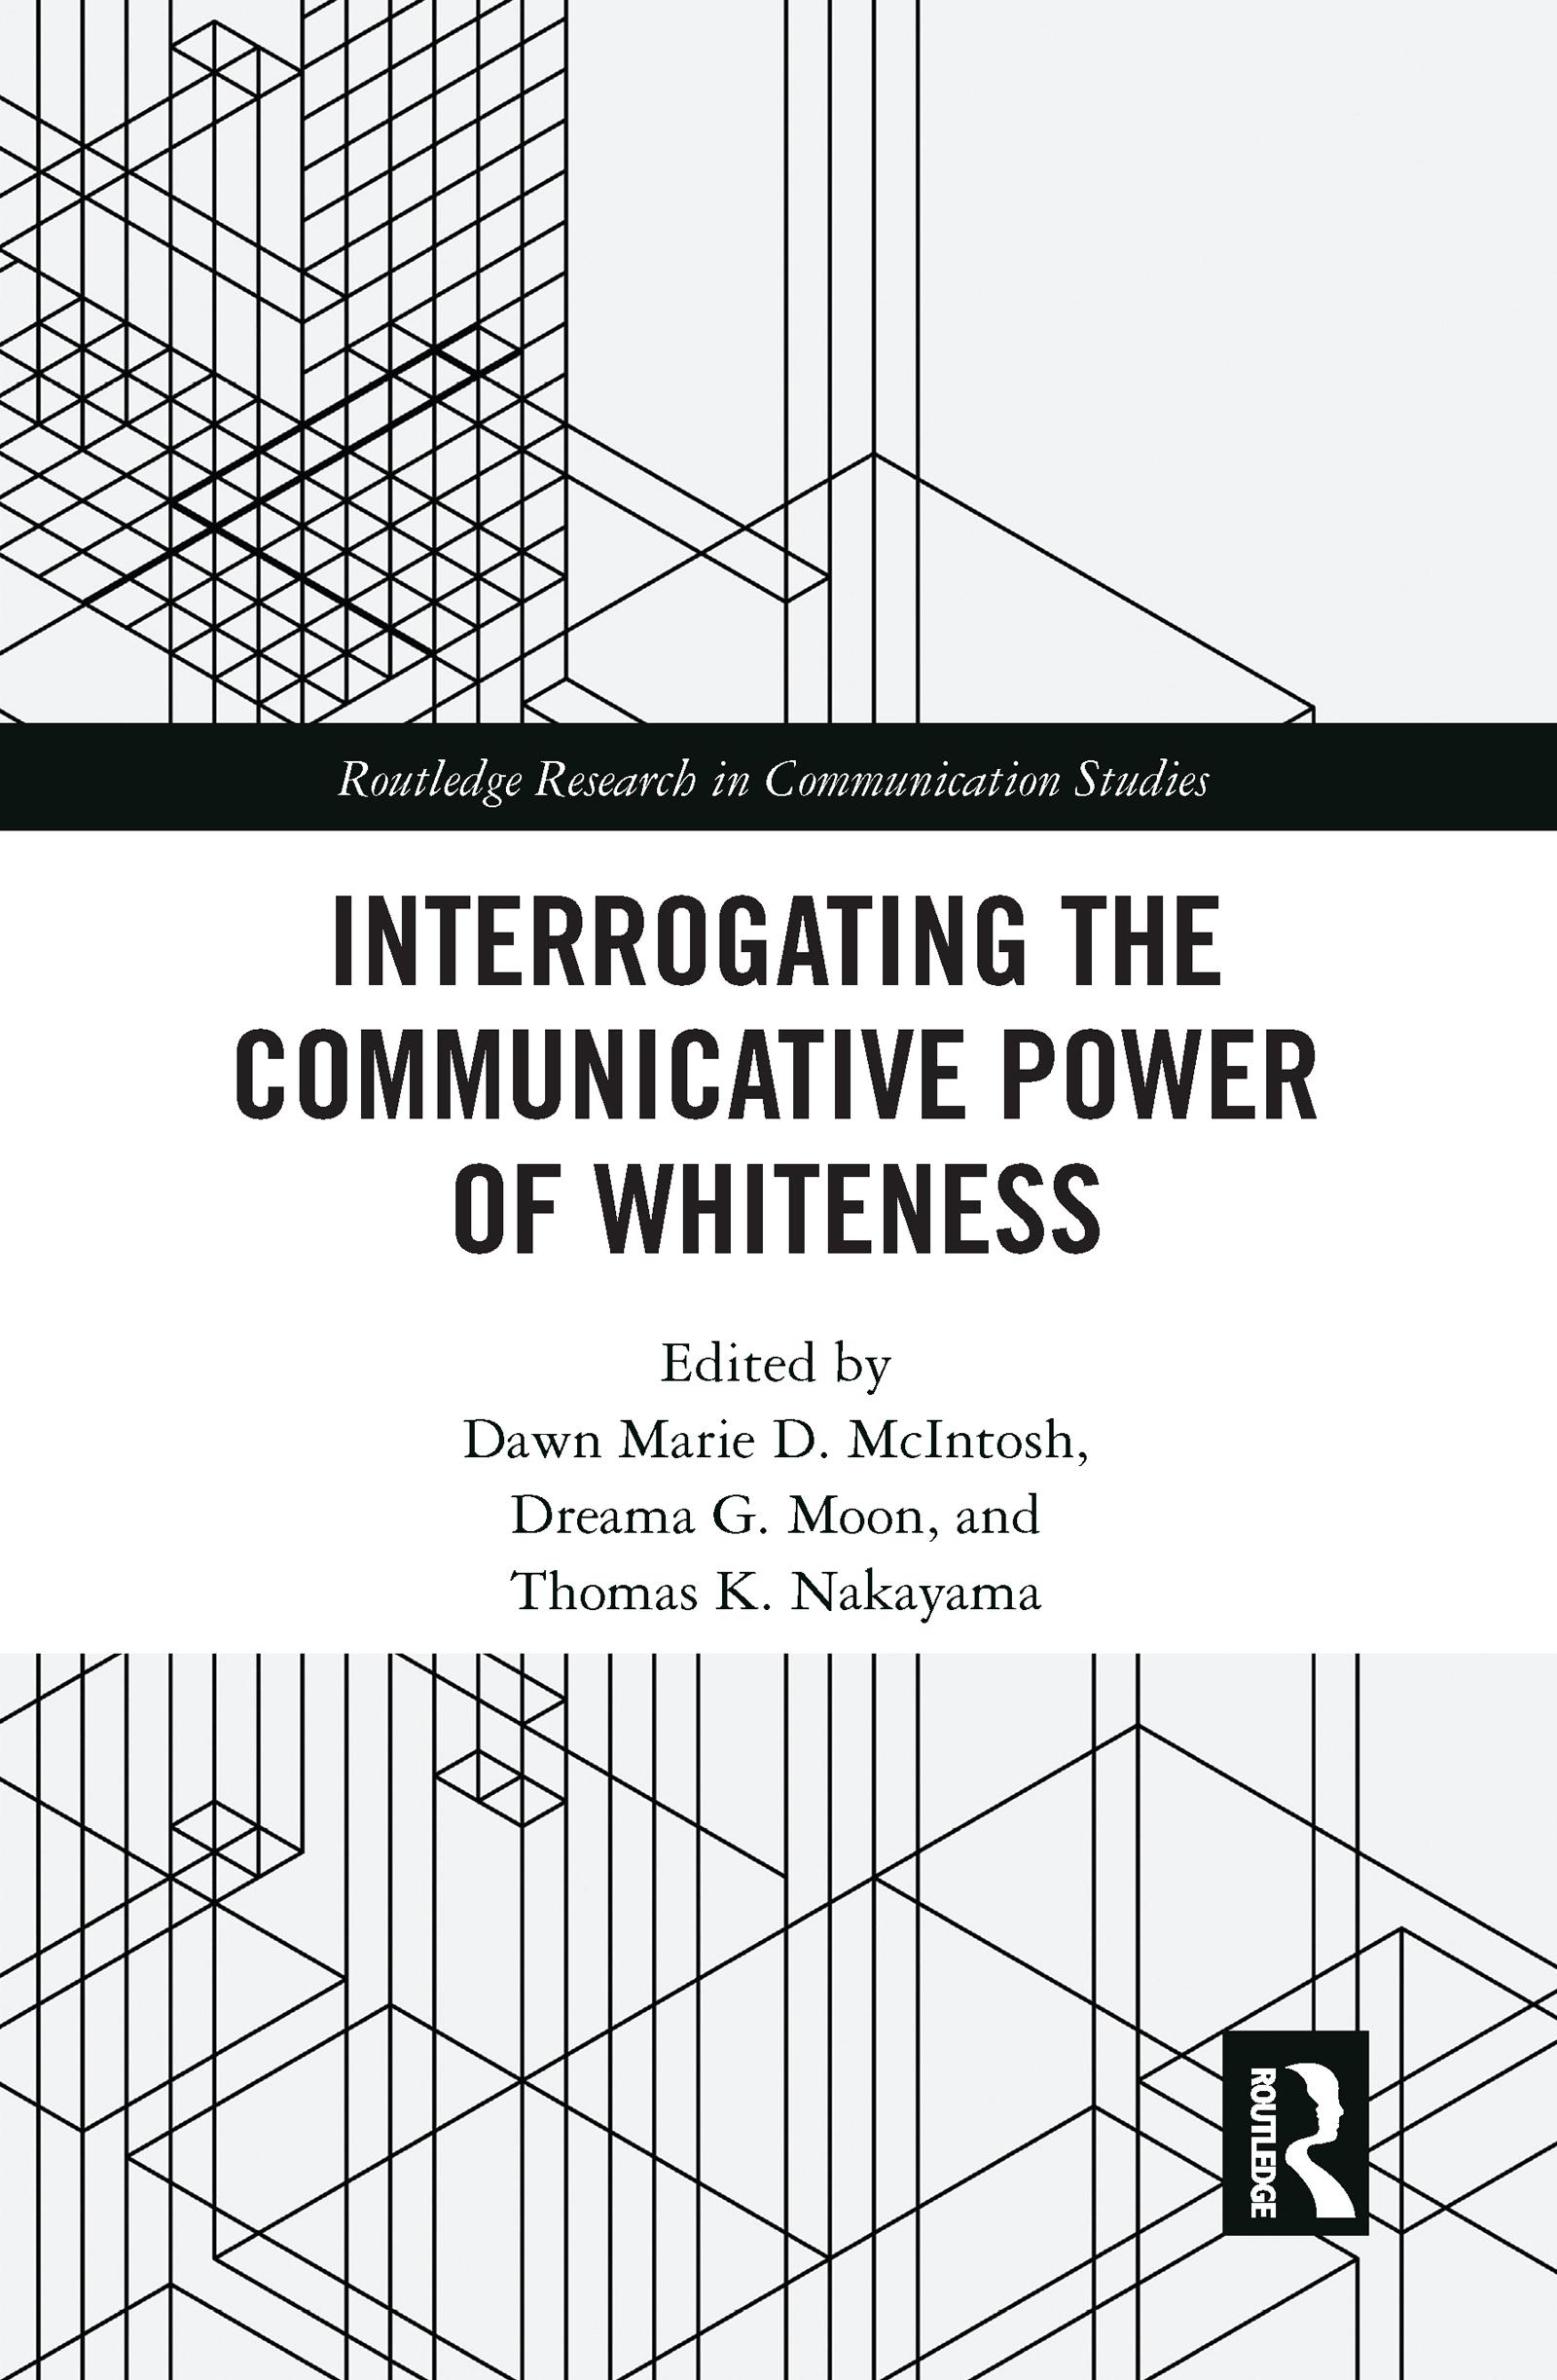 Interrogating the Communicative Power of Whiteness